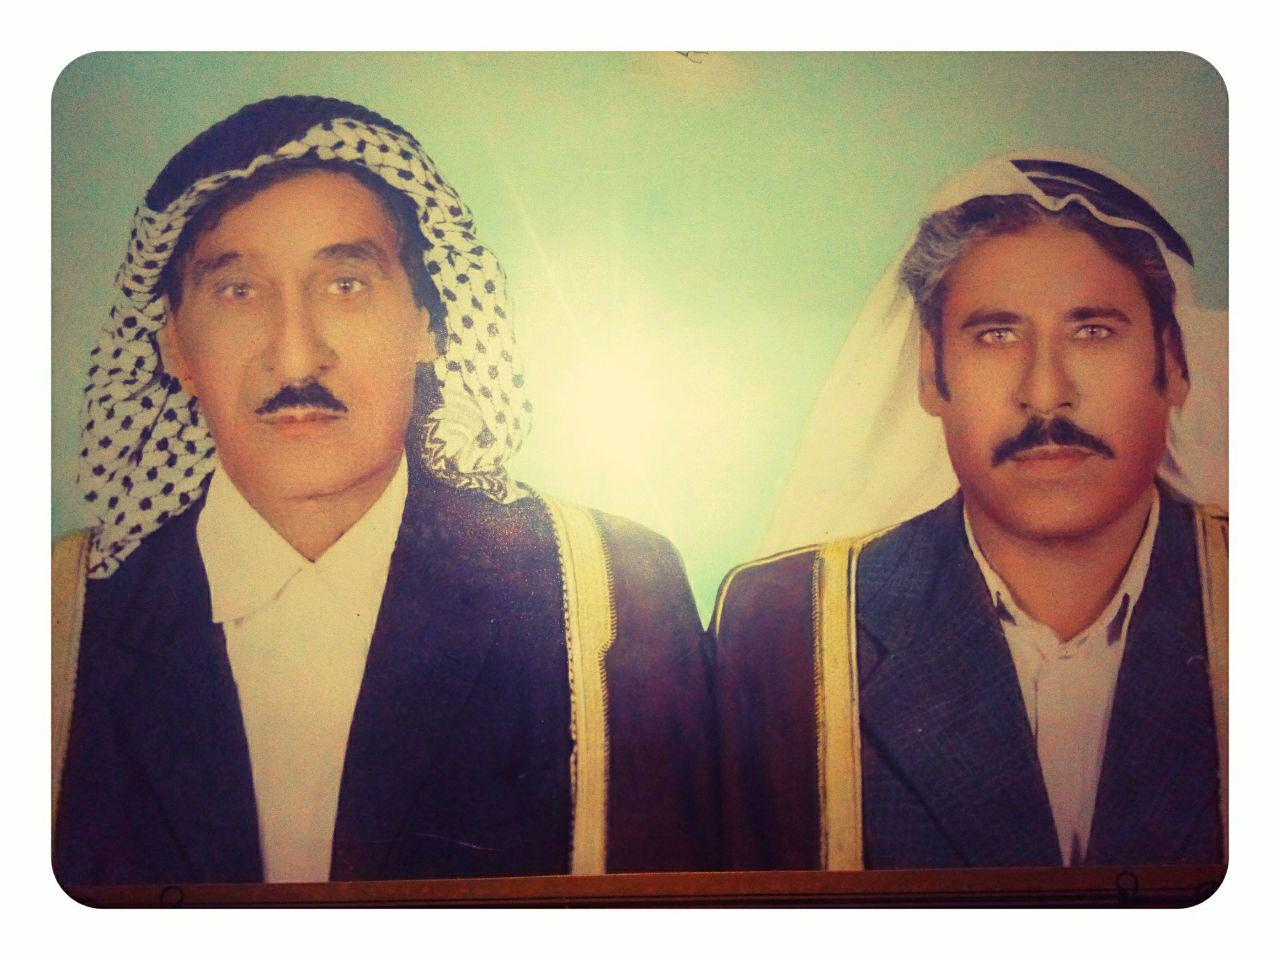 صورة الشیخ باقر بن طویهر ابن سویط مع نجله کاظم ابو یوسف